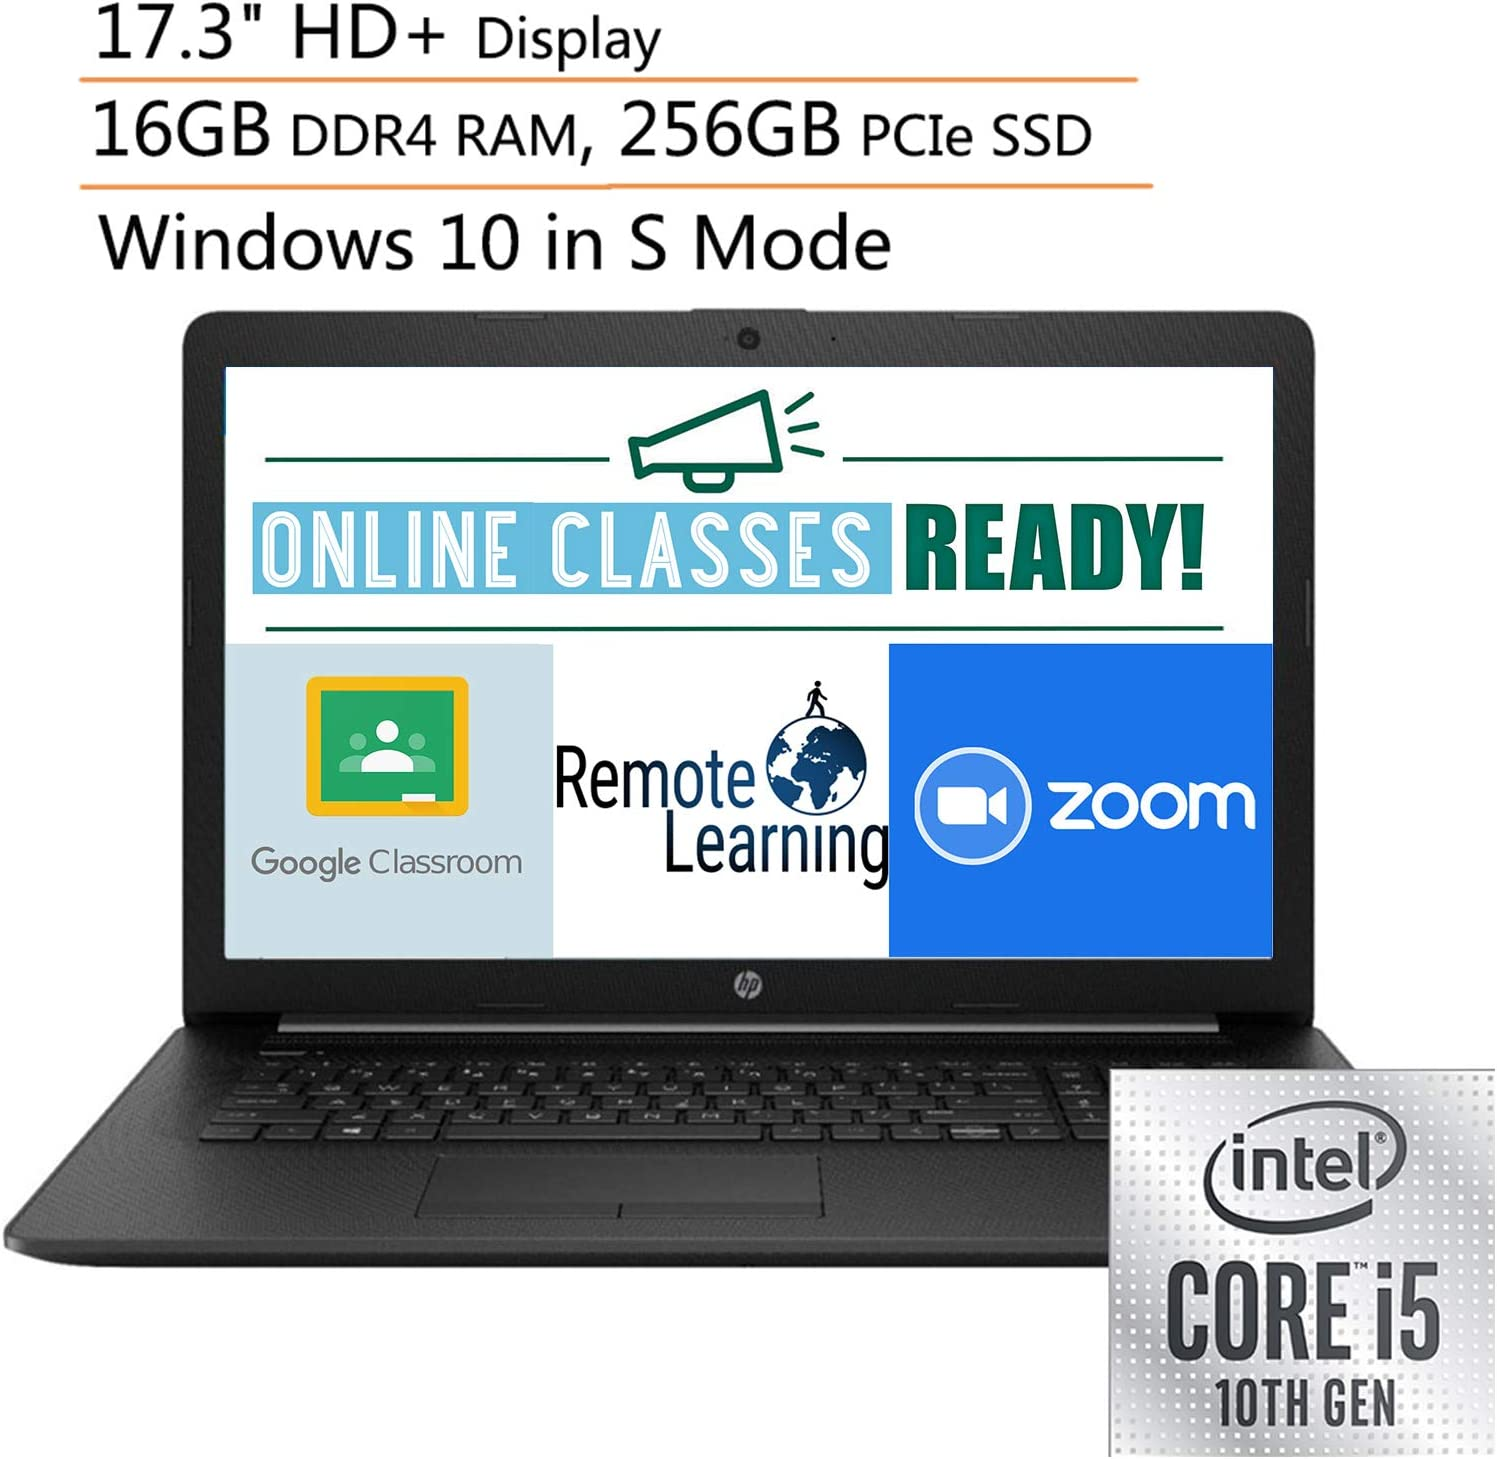 "2020 HP 17 17.3"" HD+ Laptop Computer, 10th Gen Intel Quad-Core i5 1035G1 Up to 3.4GHz (Beats i7-7500u), 16GB DDR4 RAM, 256GB PCIe SSD, DVDRW, Webcam, Windows 10, Ipuzzle Mouse Pad, Online Class Ready"